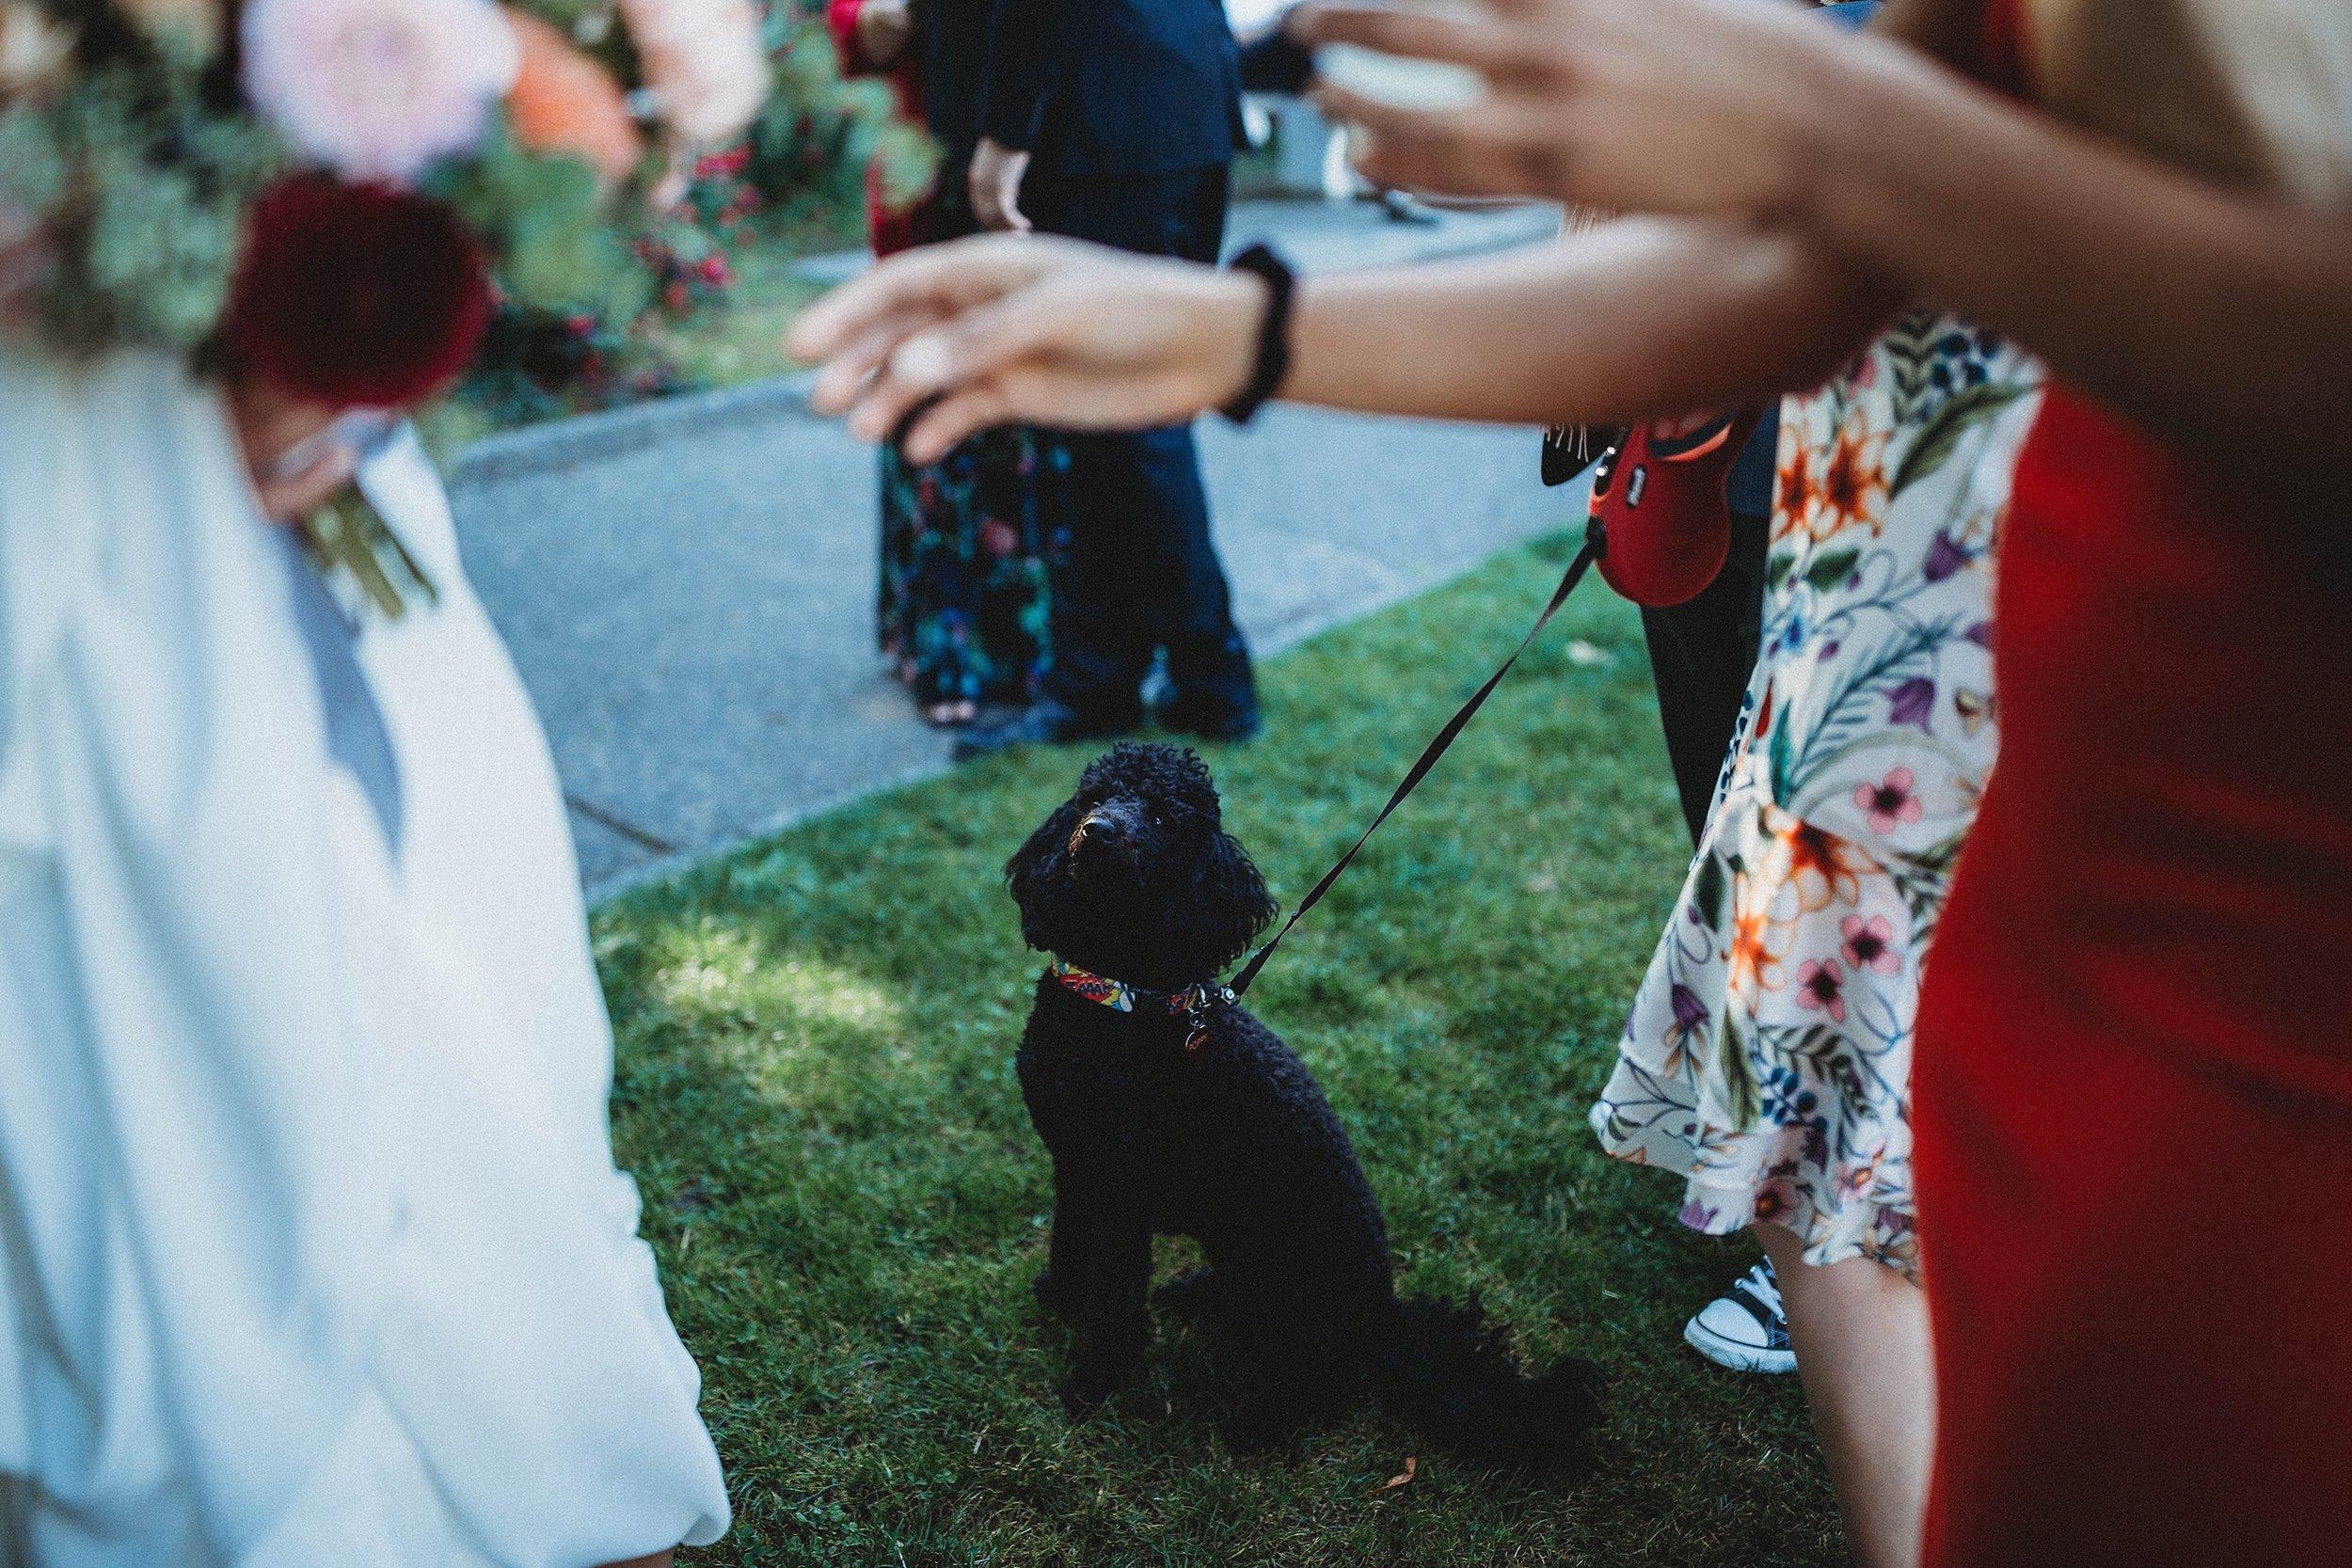 yinshi david - seattle wedding photographer - SAM wedding volunteer park reception -28.jpg